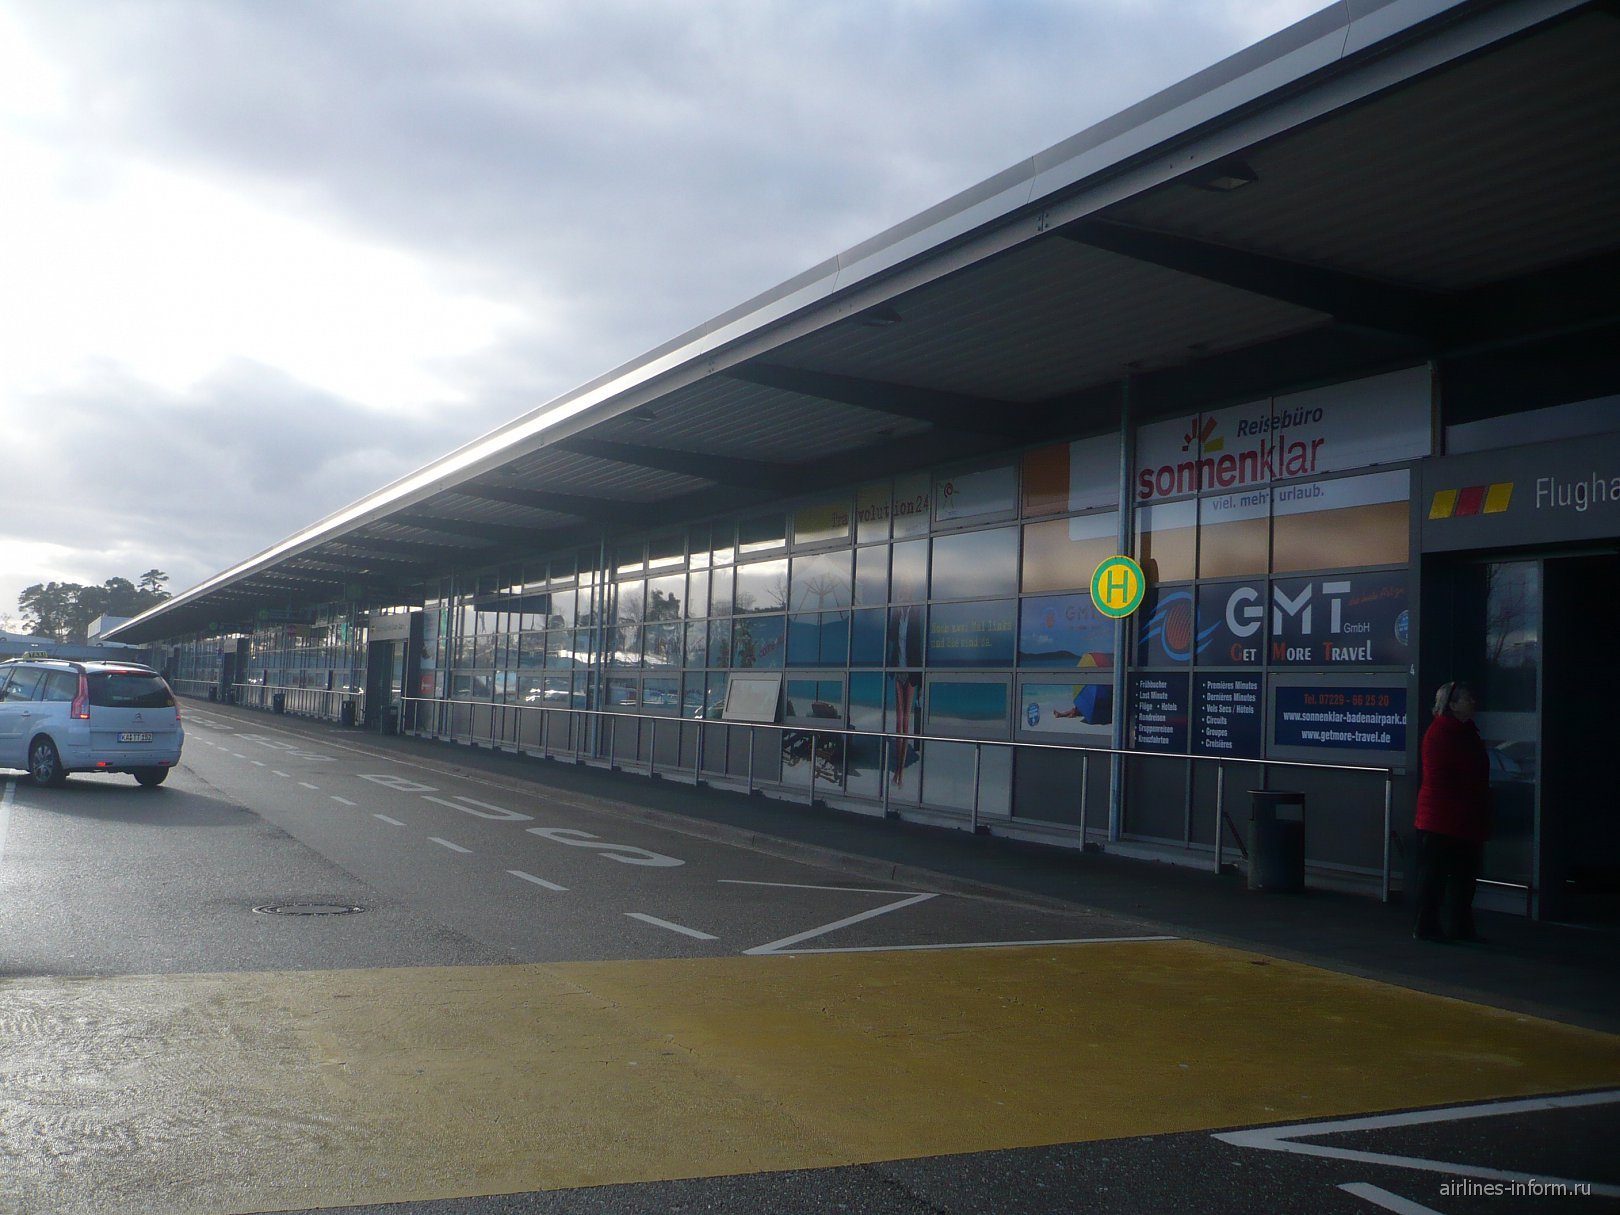 Аэровокзал аэропорта Карлсруэ Баден-Баден